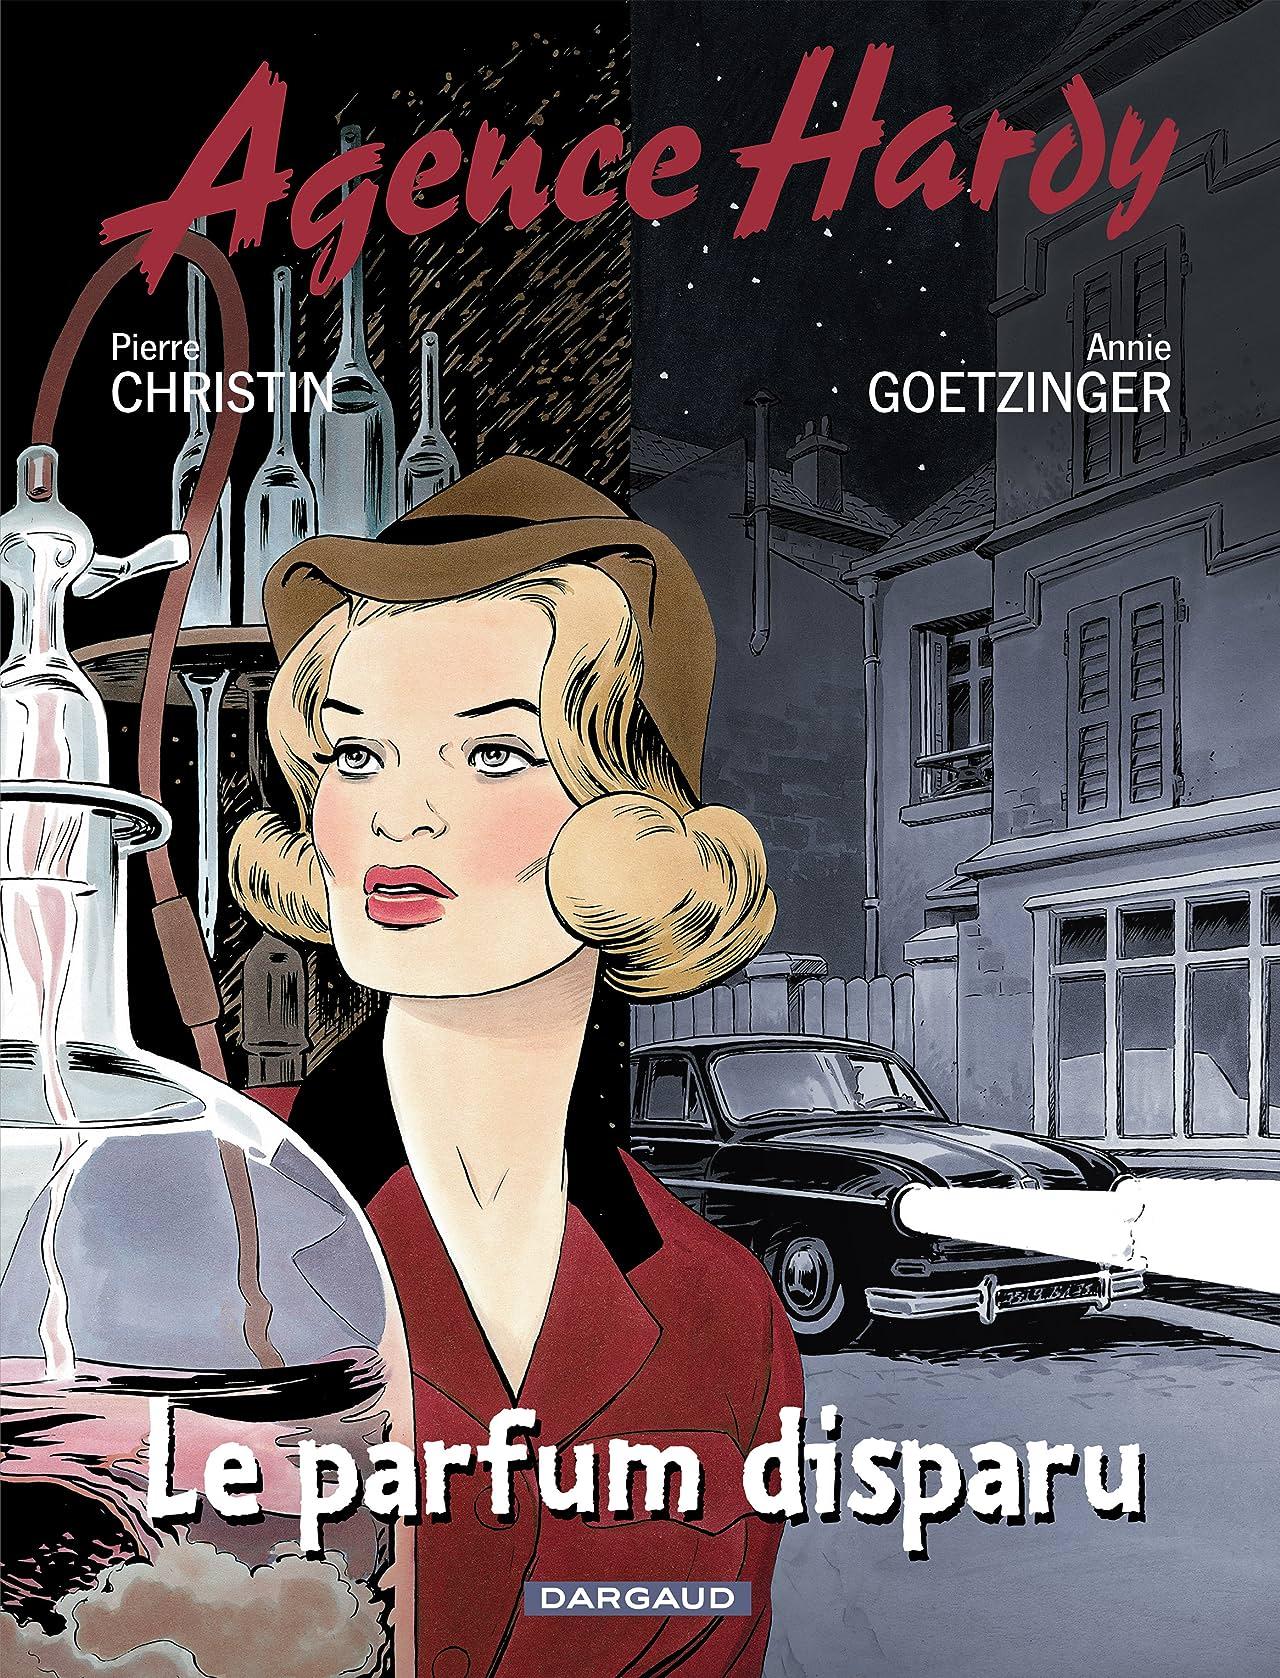 Agence Hardy Vol. 1: Le parfum disparu